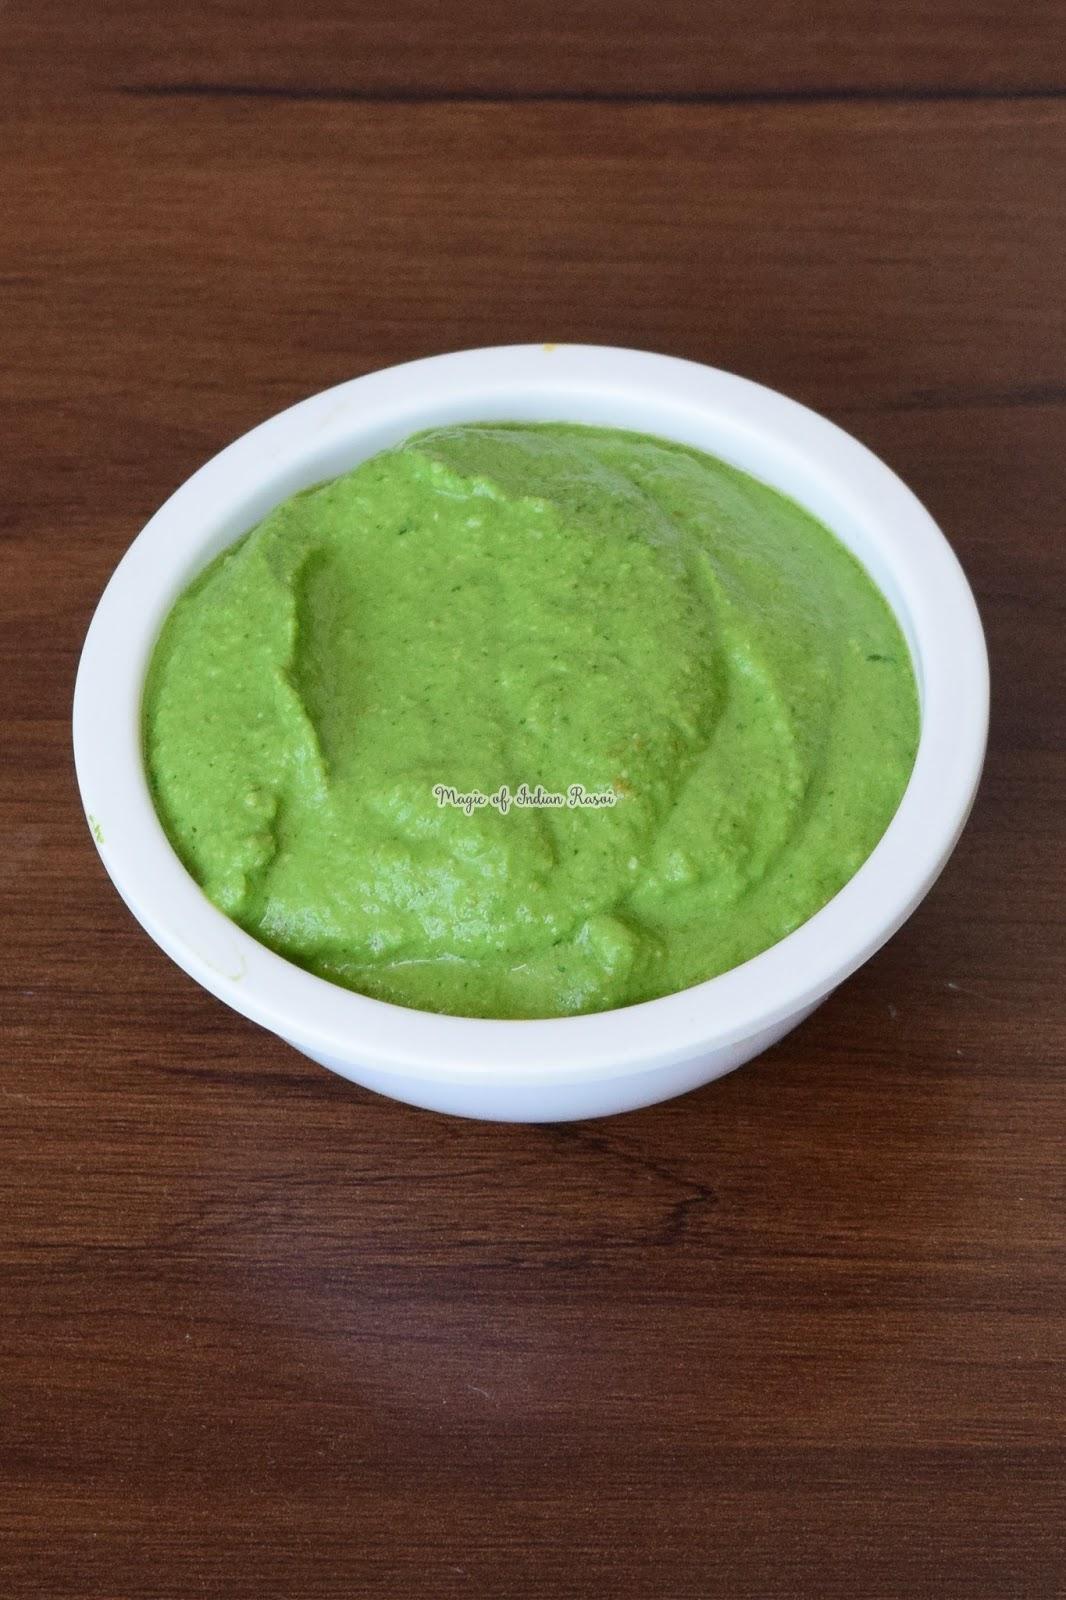 Dhaniya Pudina Chutney - Mint Coriander Chutney Recipe - Green Chatni - Hari Chatni - धनिया पुदीने की चटनी रेसिपी - Priya R - Magic of Indian Rasoi